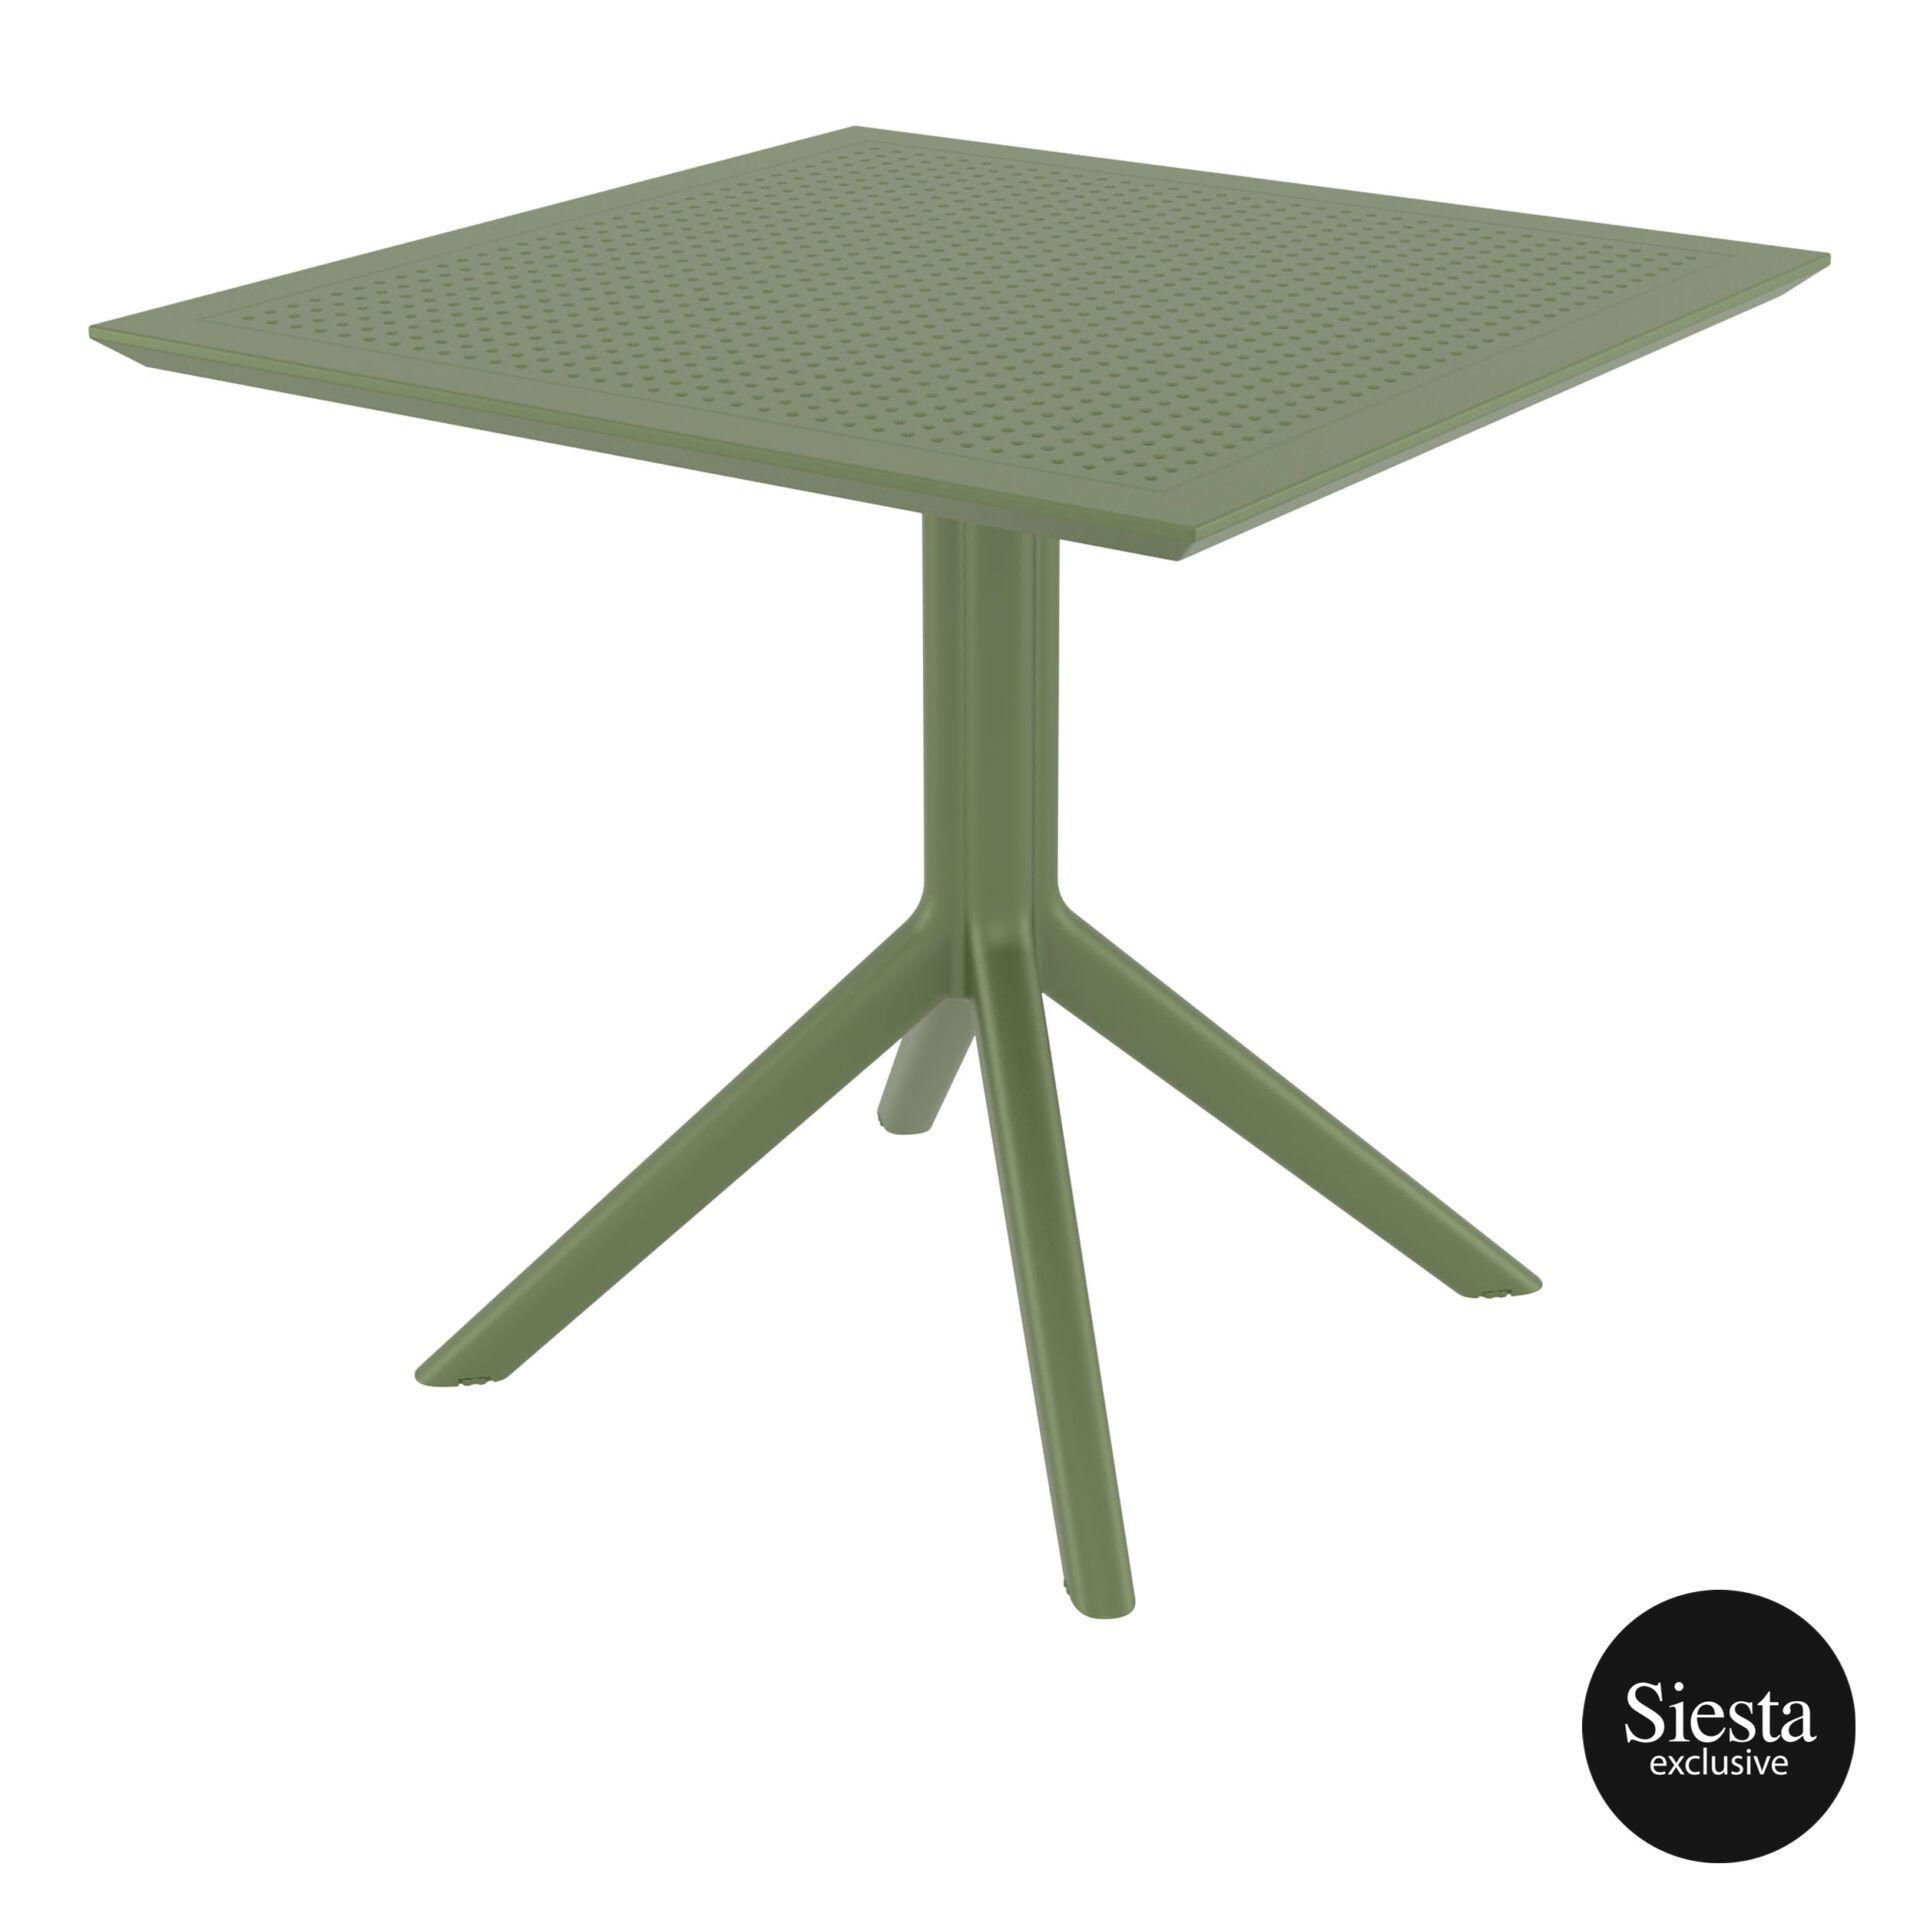 polypropylene outdoor cafe sky table 80 olive green front side 1